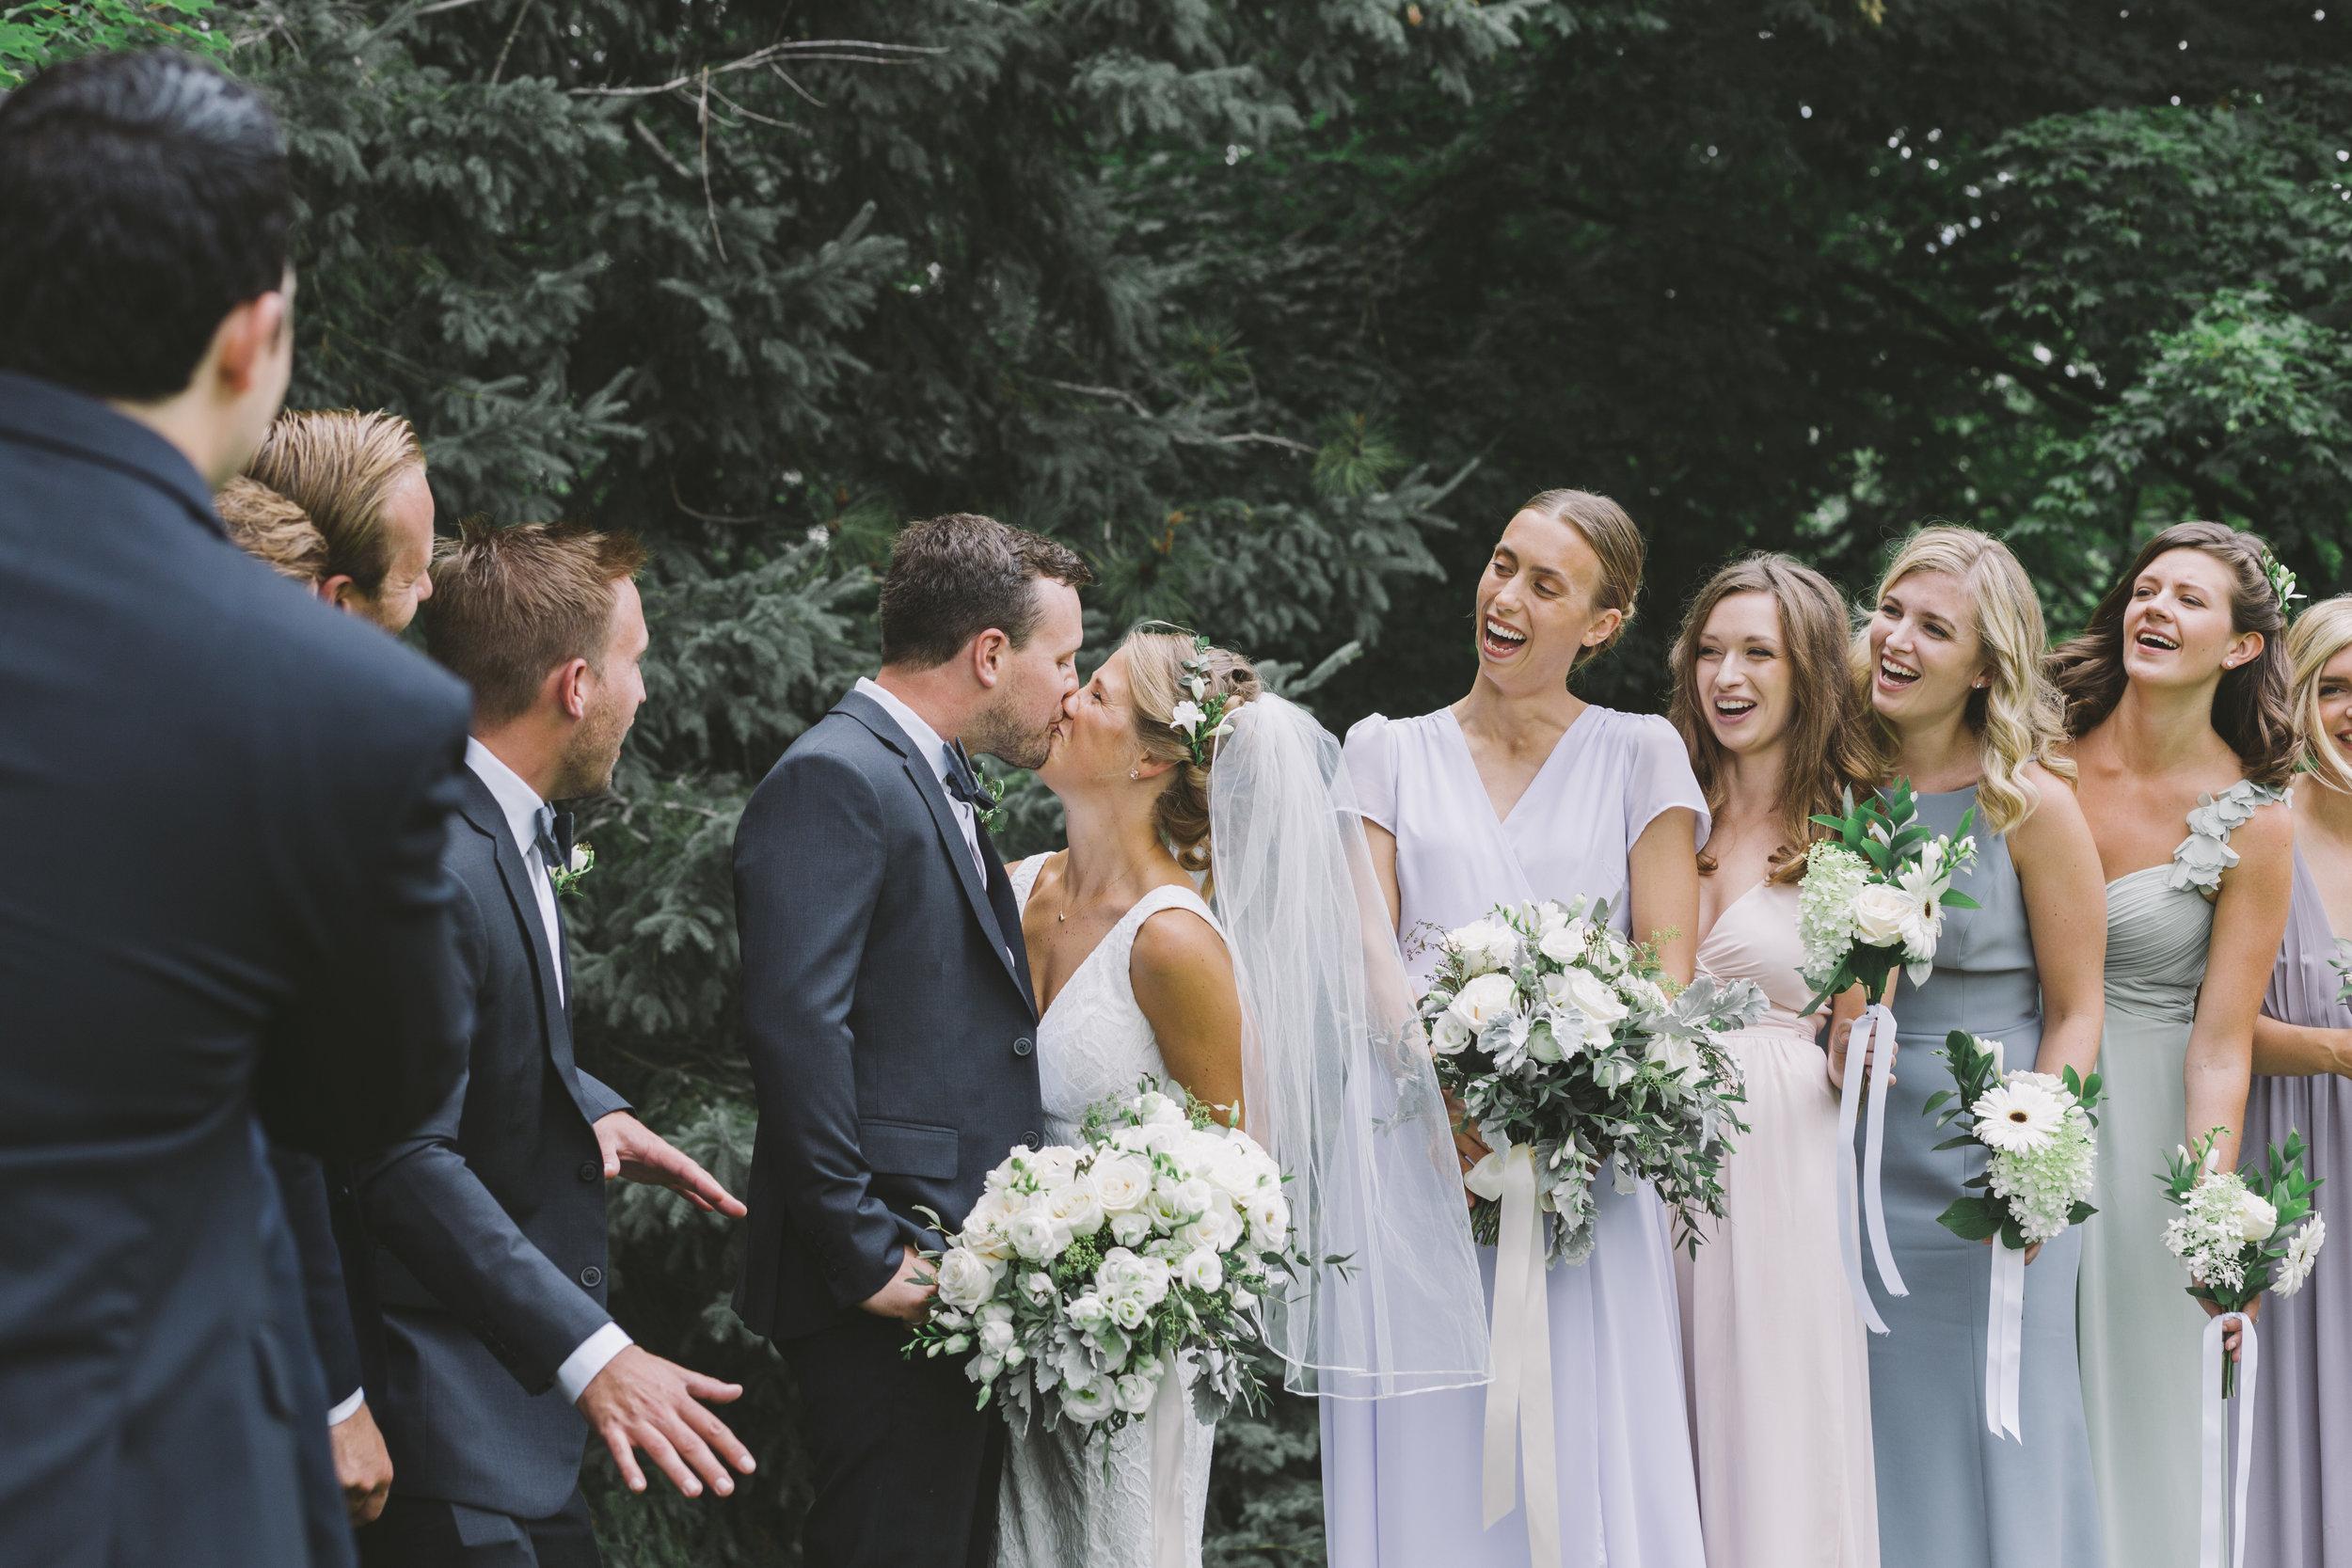 Wedding Kiss at Drysdale's Tree Farm